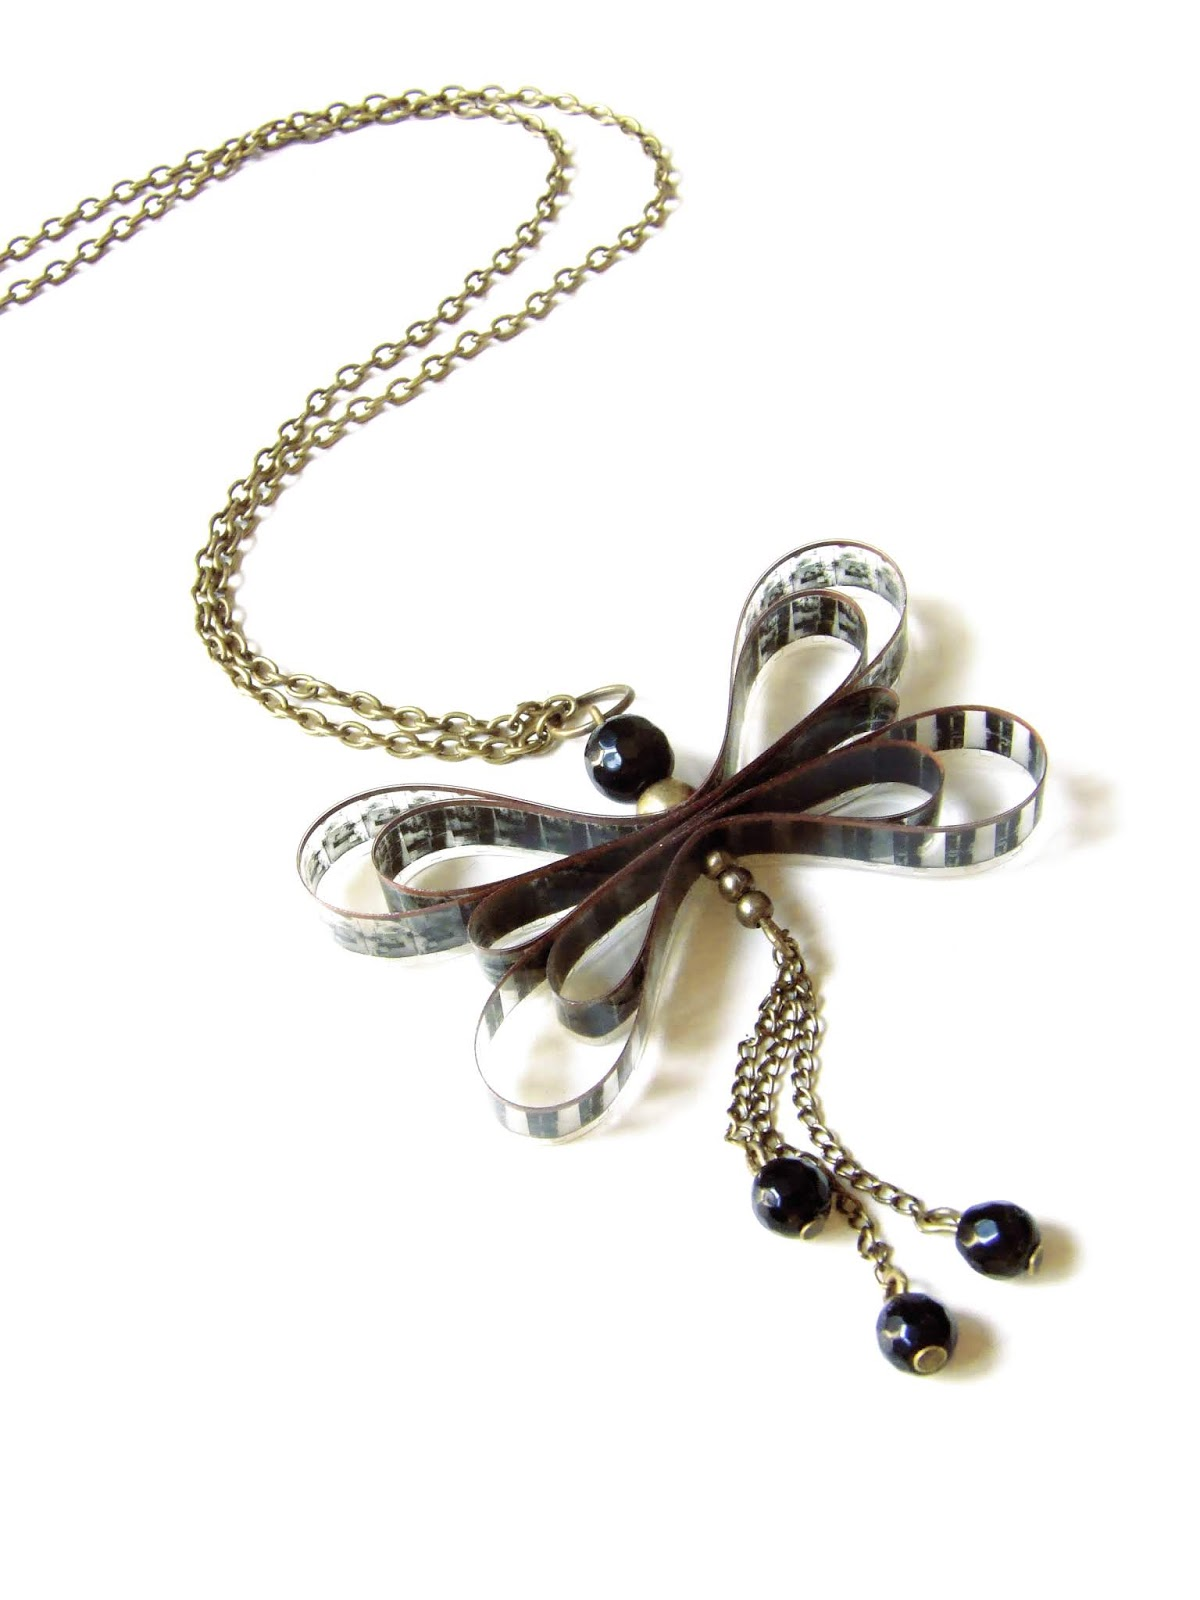 https://oddity-london-tienda.blogspot.com/2013/07/colgante-mariposa.html